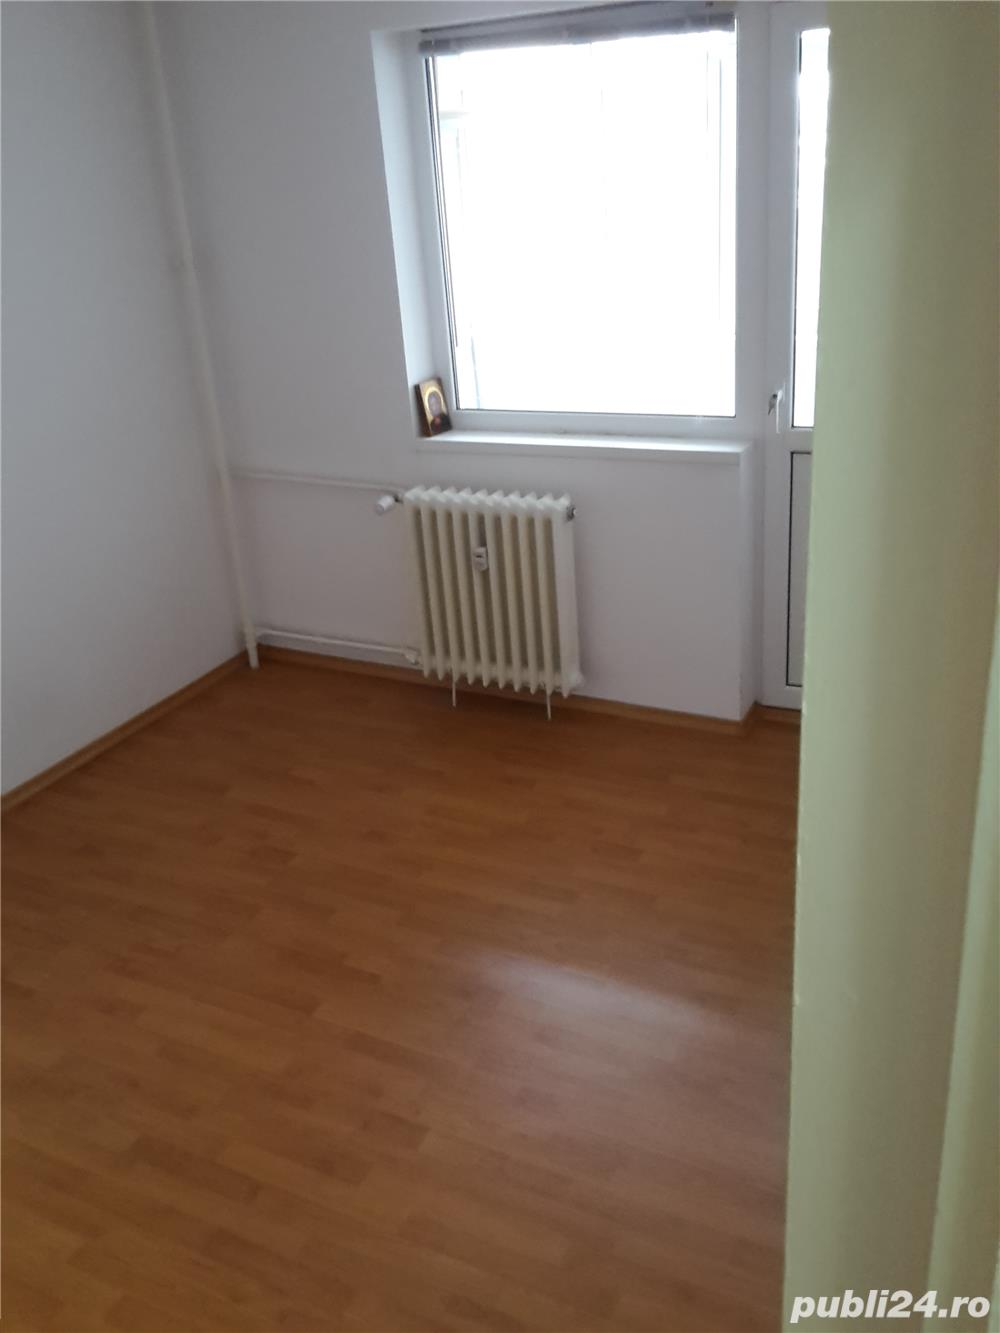 Apartament 2 camere Berceni - Alexandru Obregia